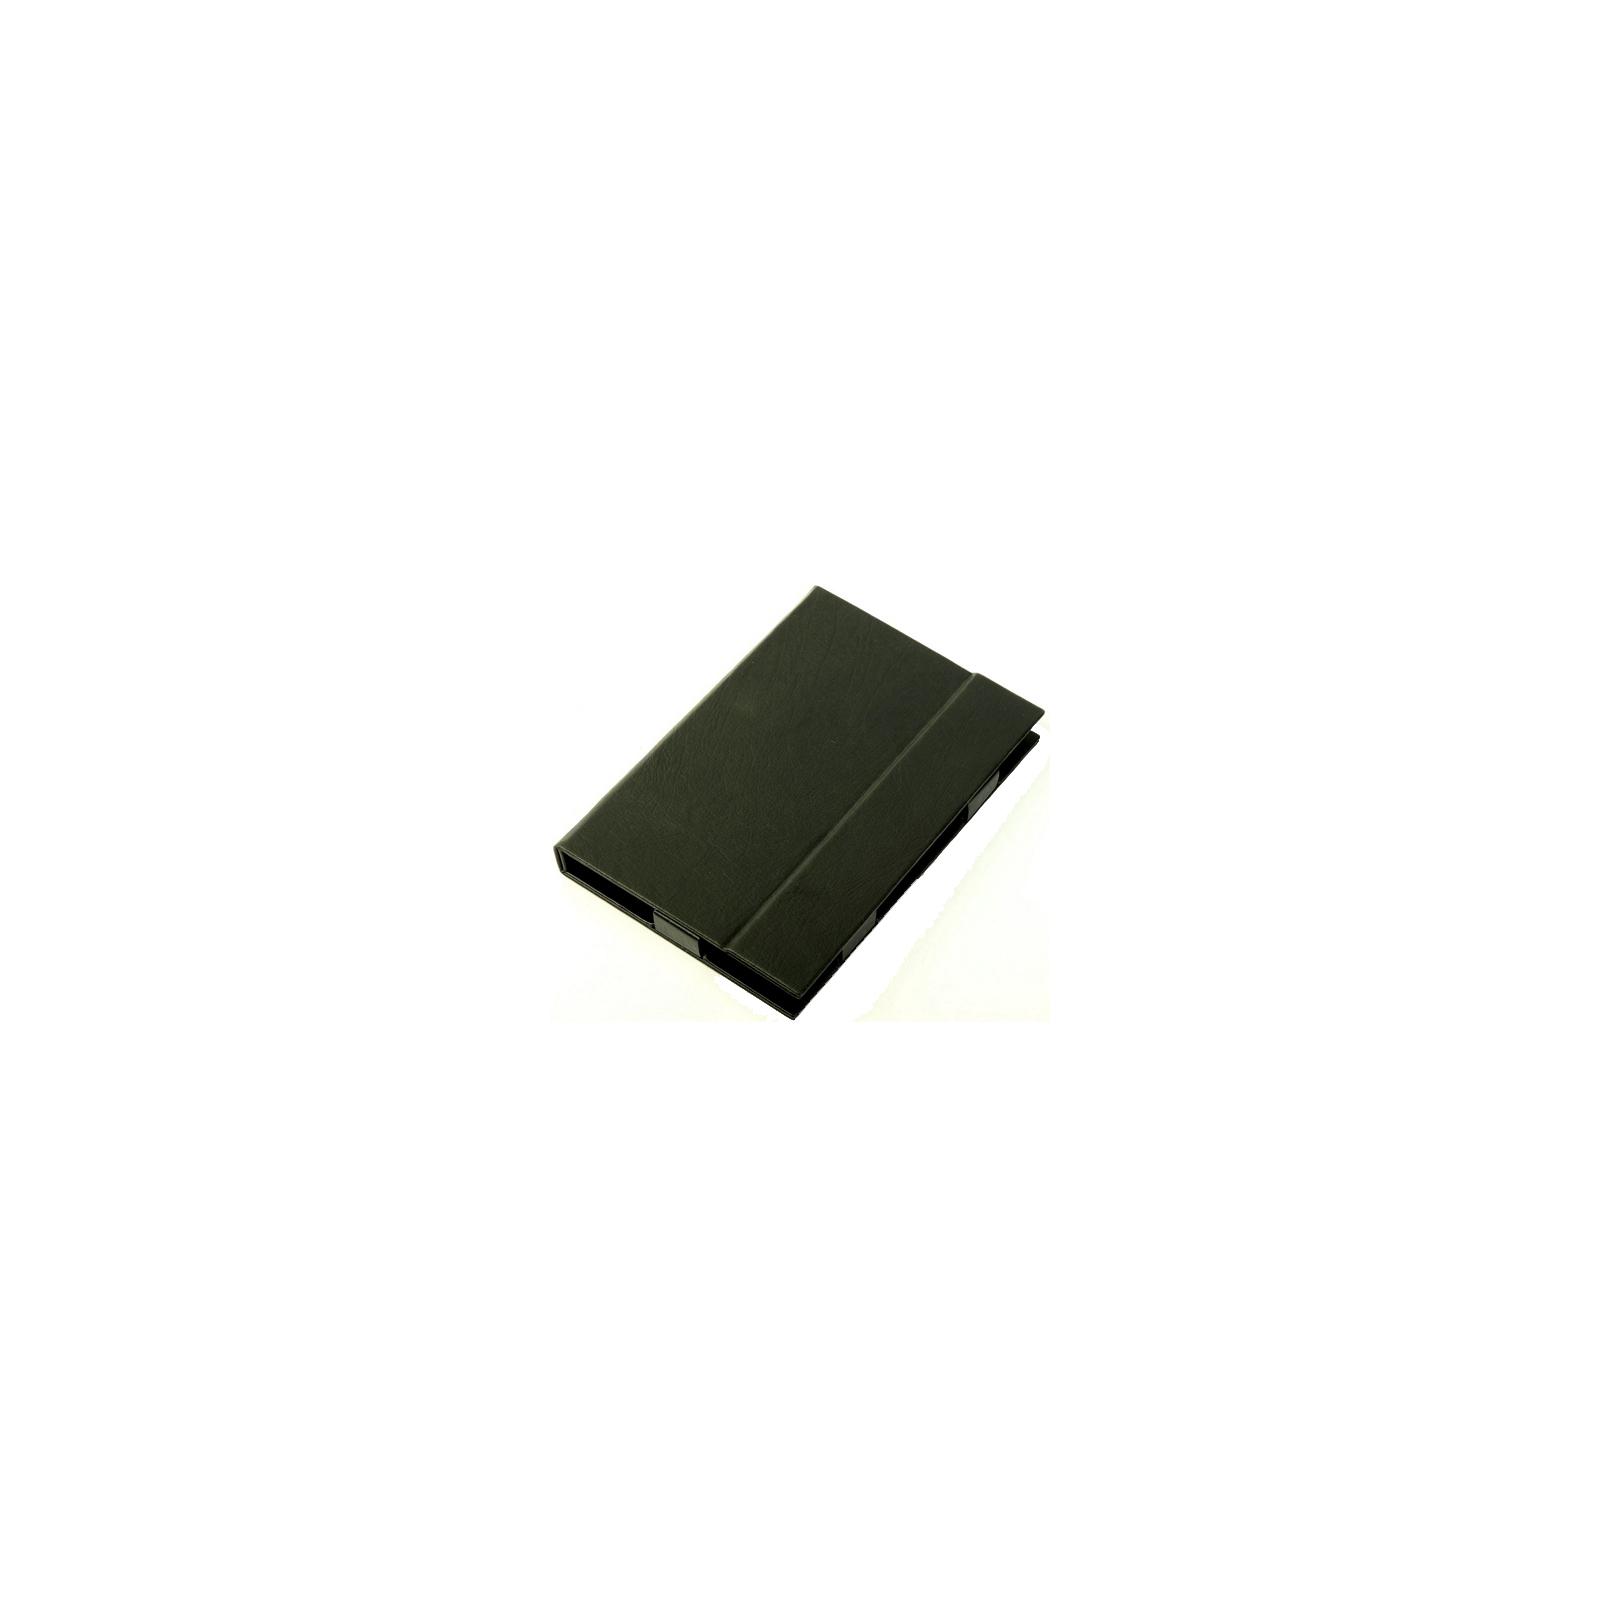 Чехол для планшета Vento 9.7 Desire Matt - black